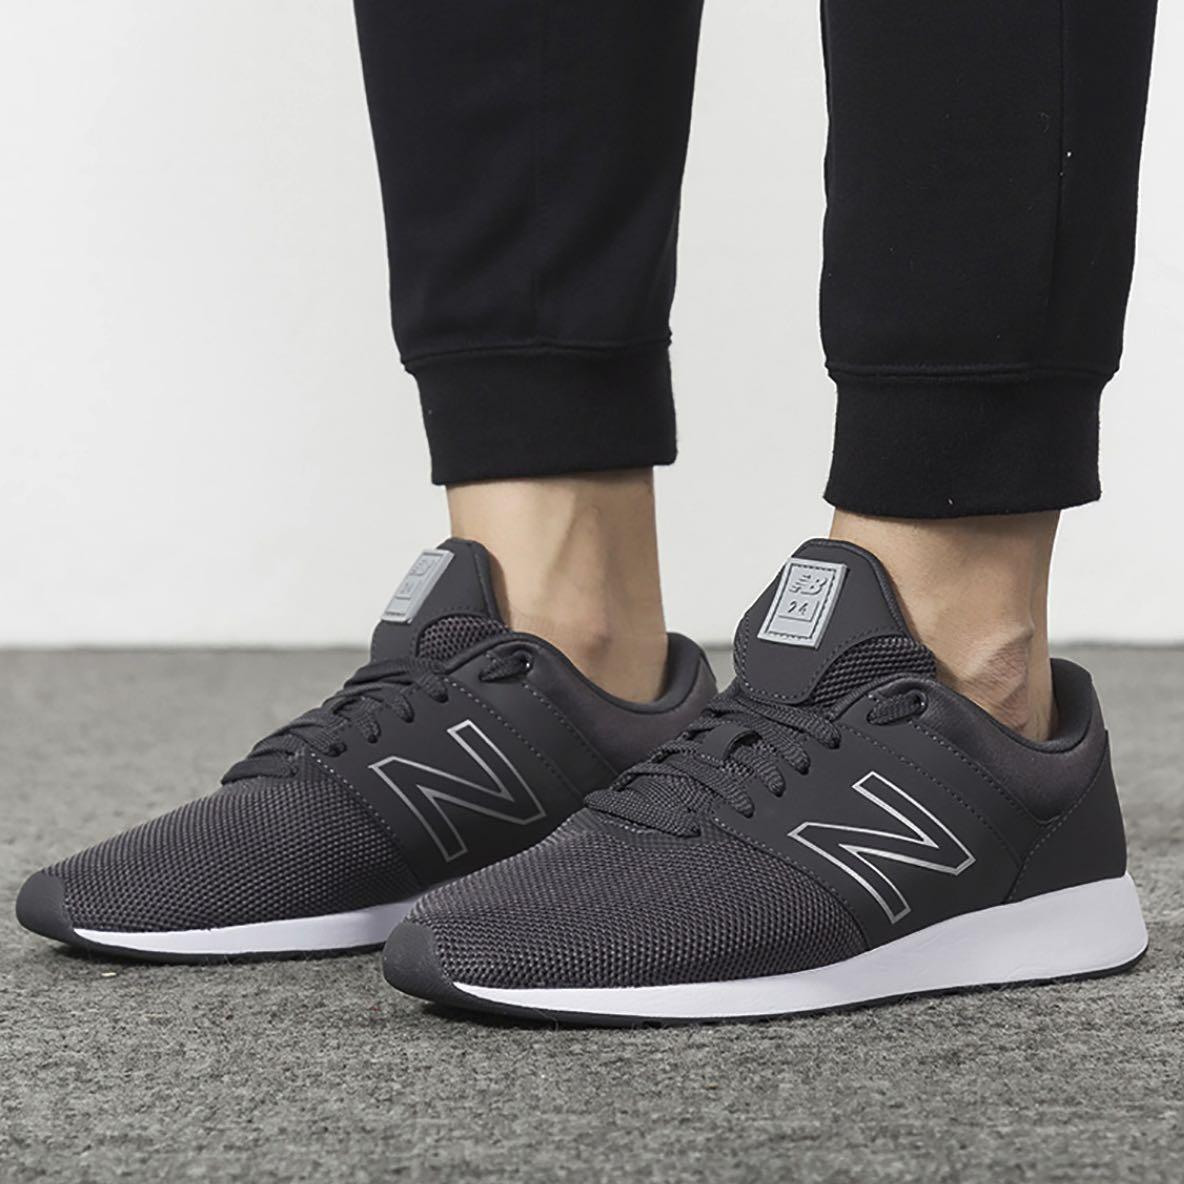 New Balance NB24 男款休闲运动鞋